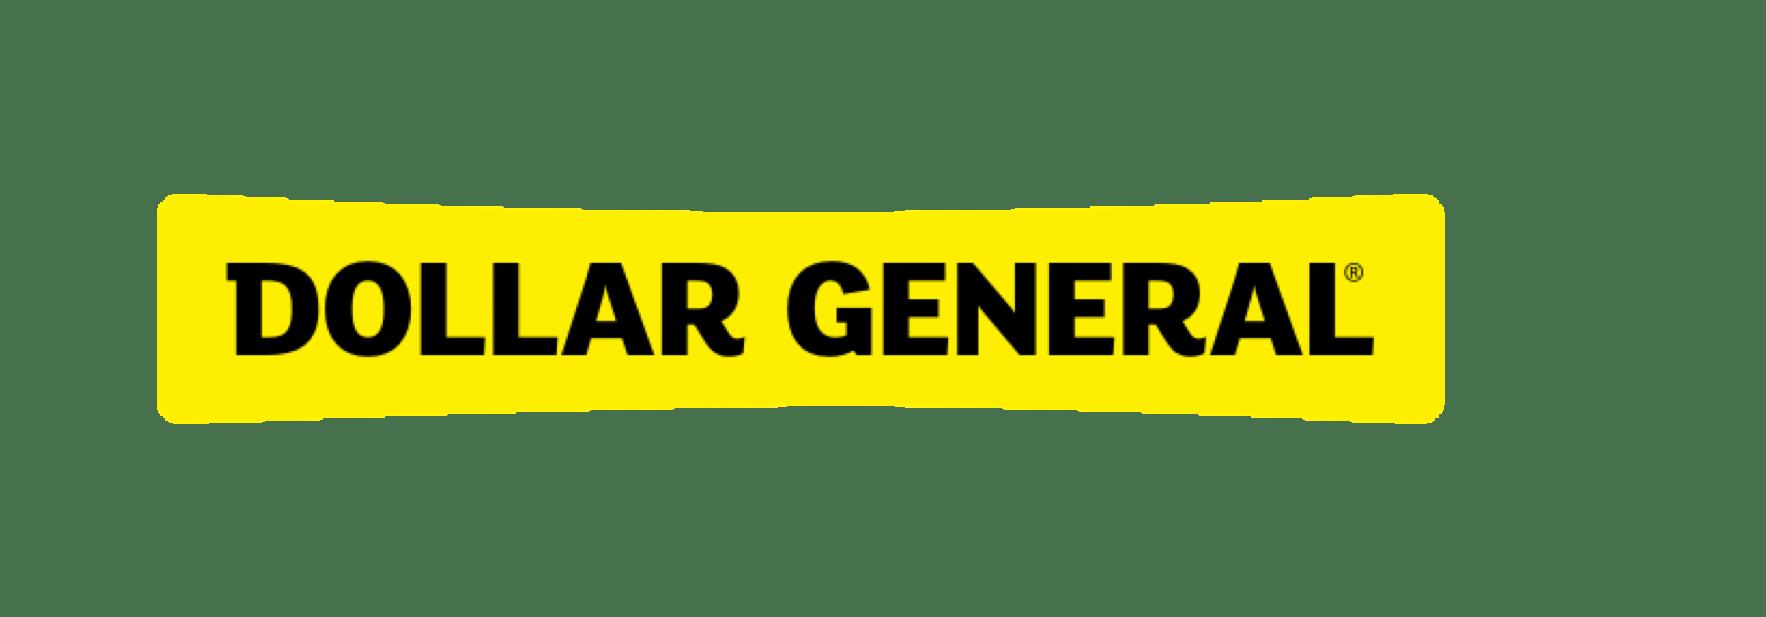 seasonal dollar general